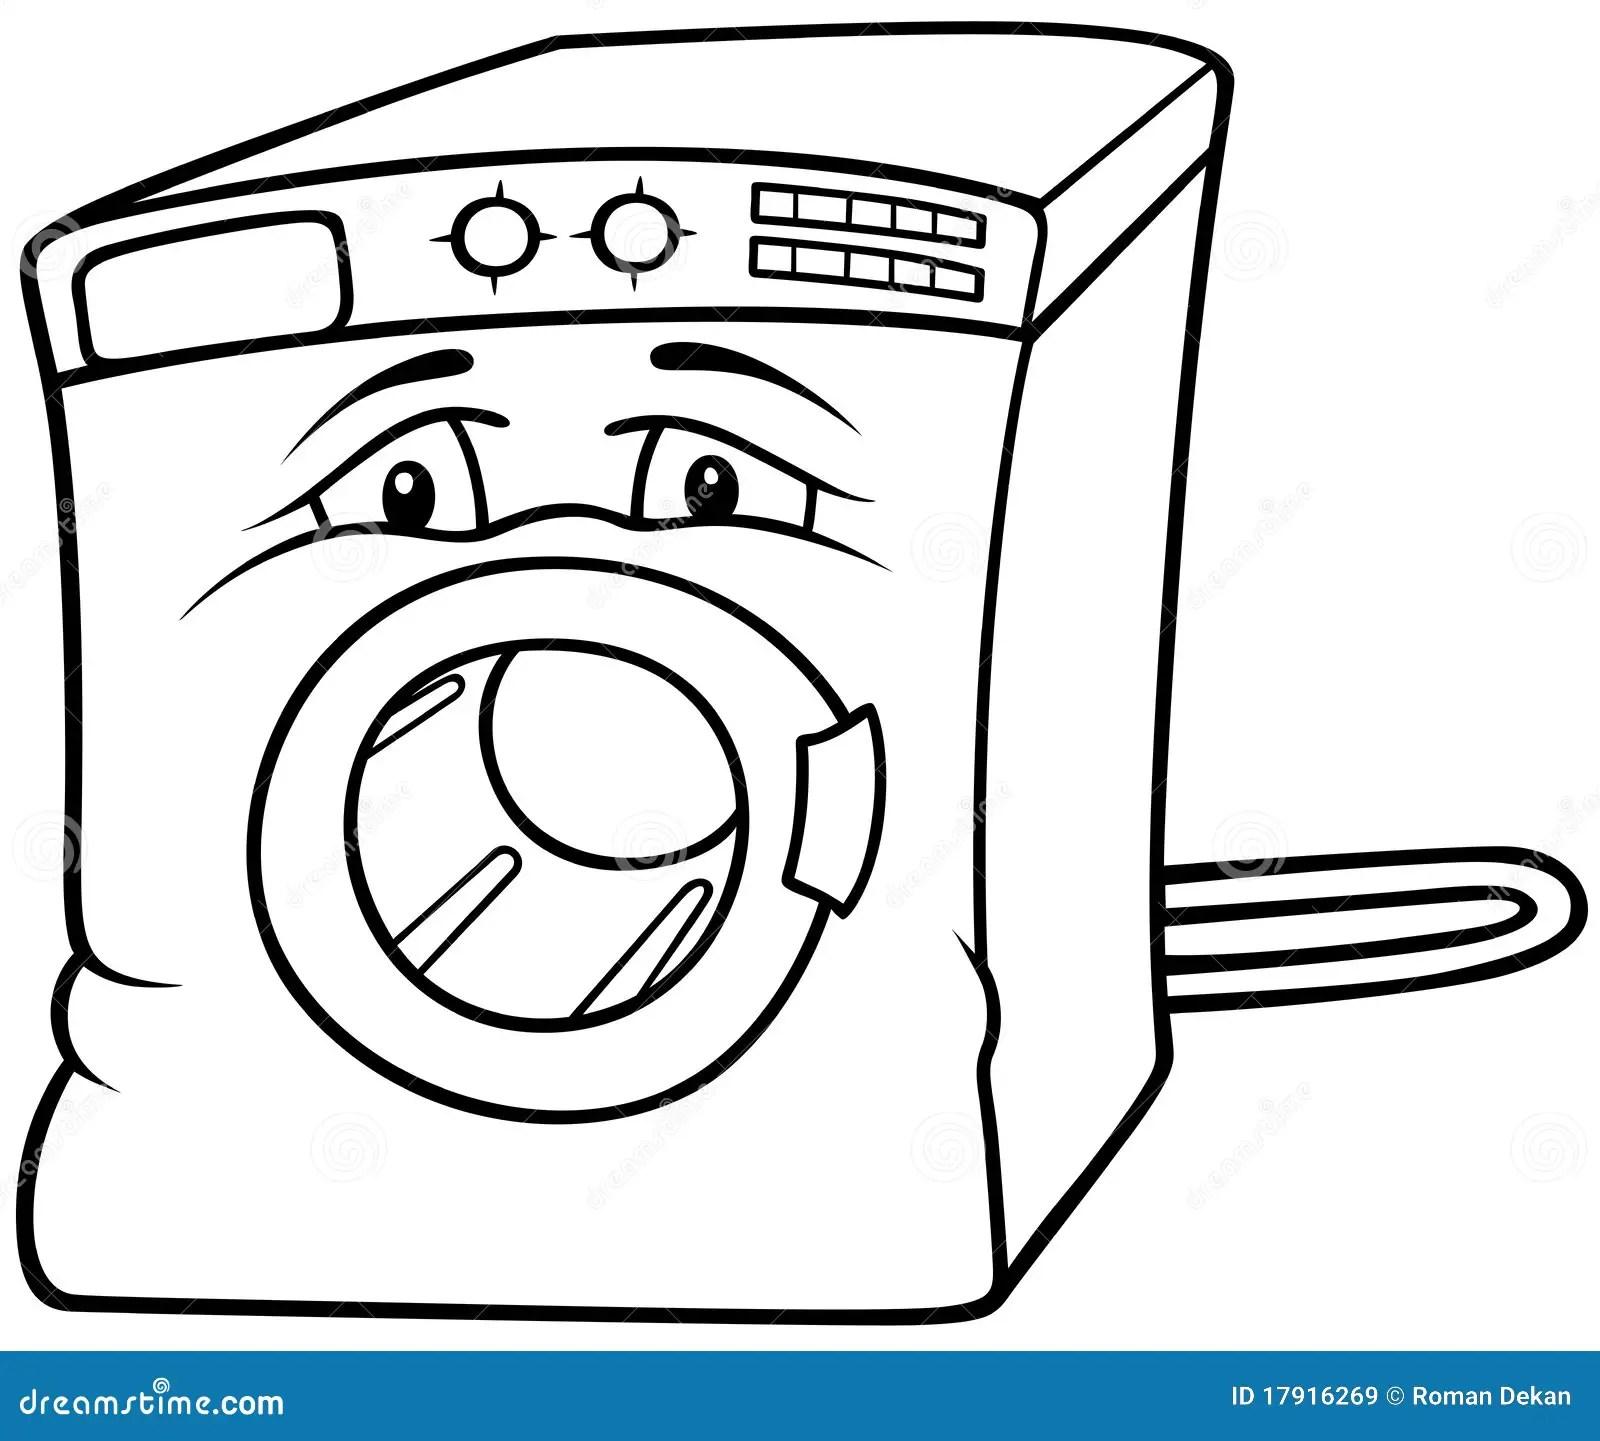 Washing Machine stock vector. Illustration of electronic